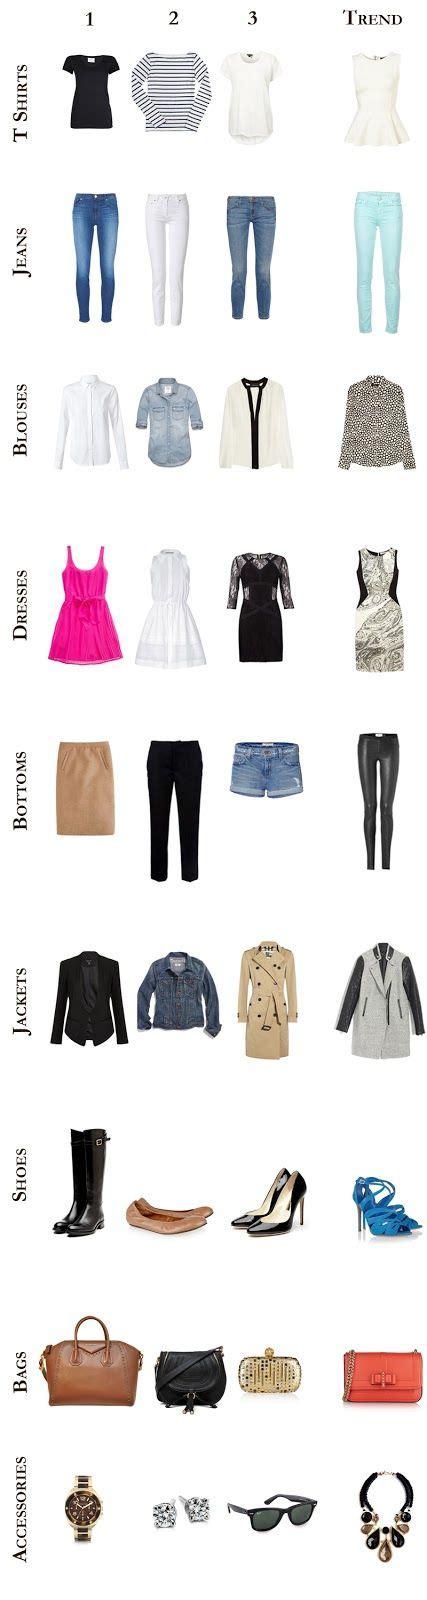 wardrobe essentials clothes wardrobes